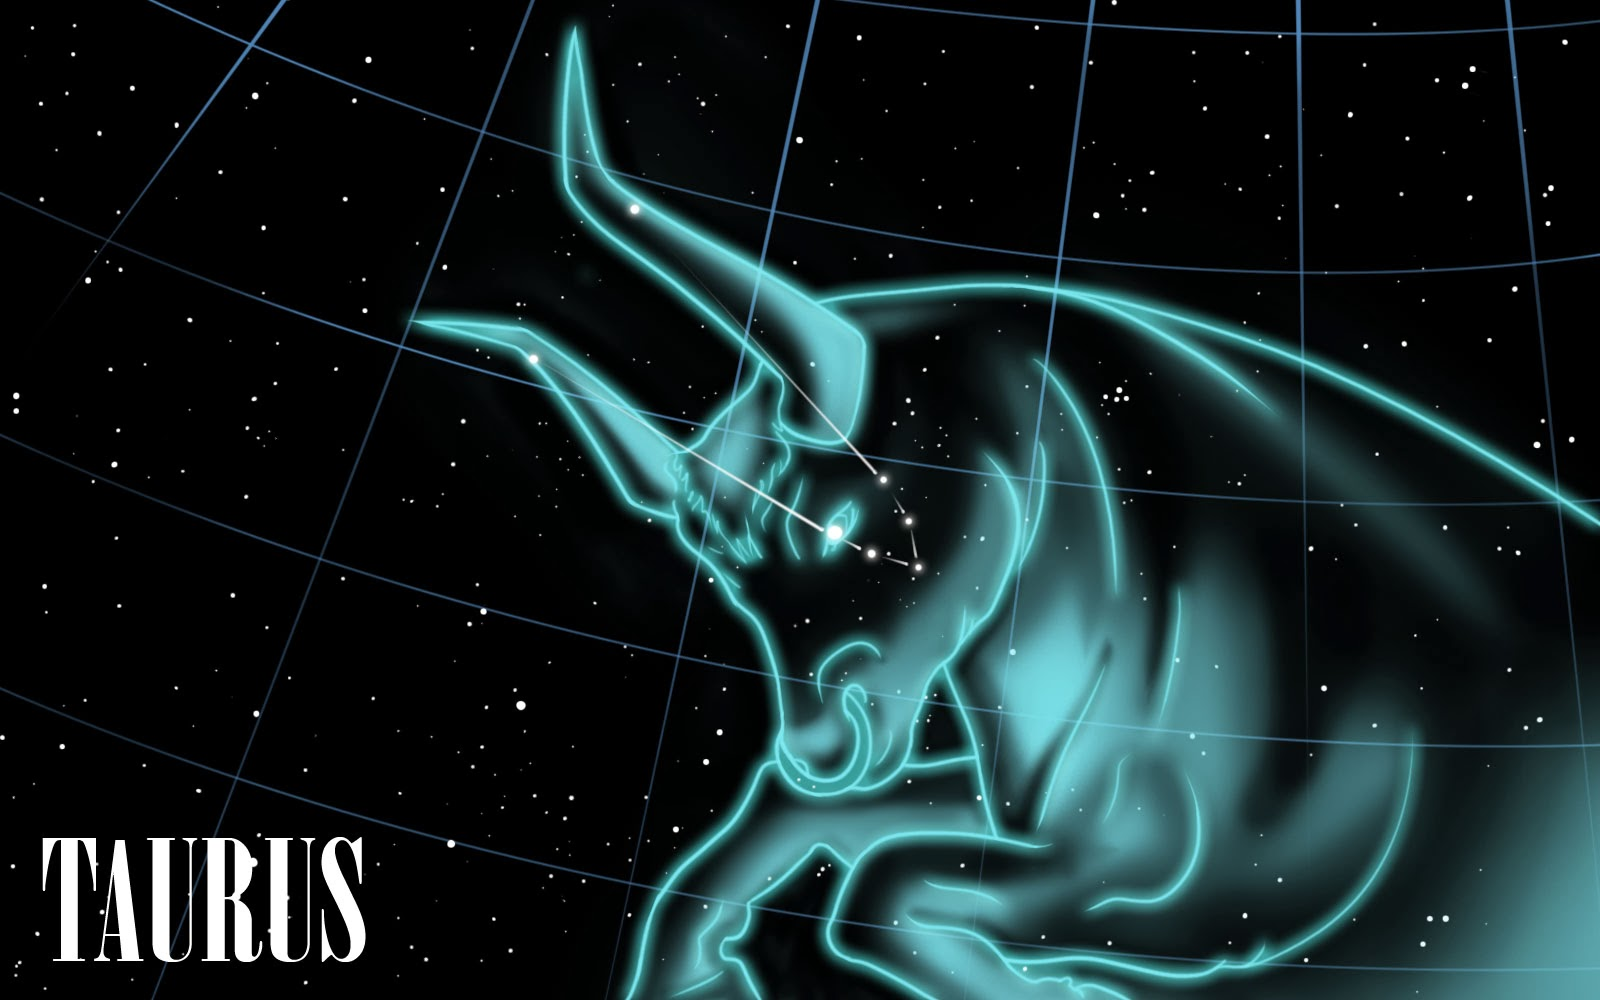 Ramalan Zodiak Taurus Minggu Ini 3 - 9 Maret 2014